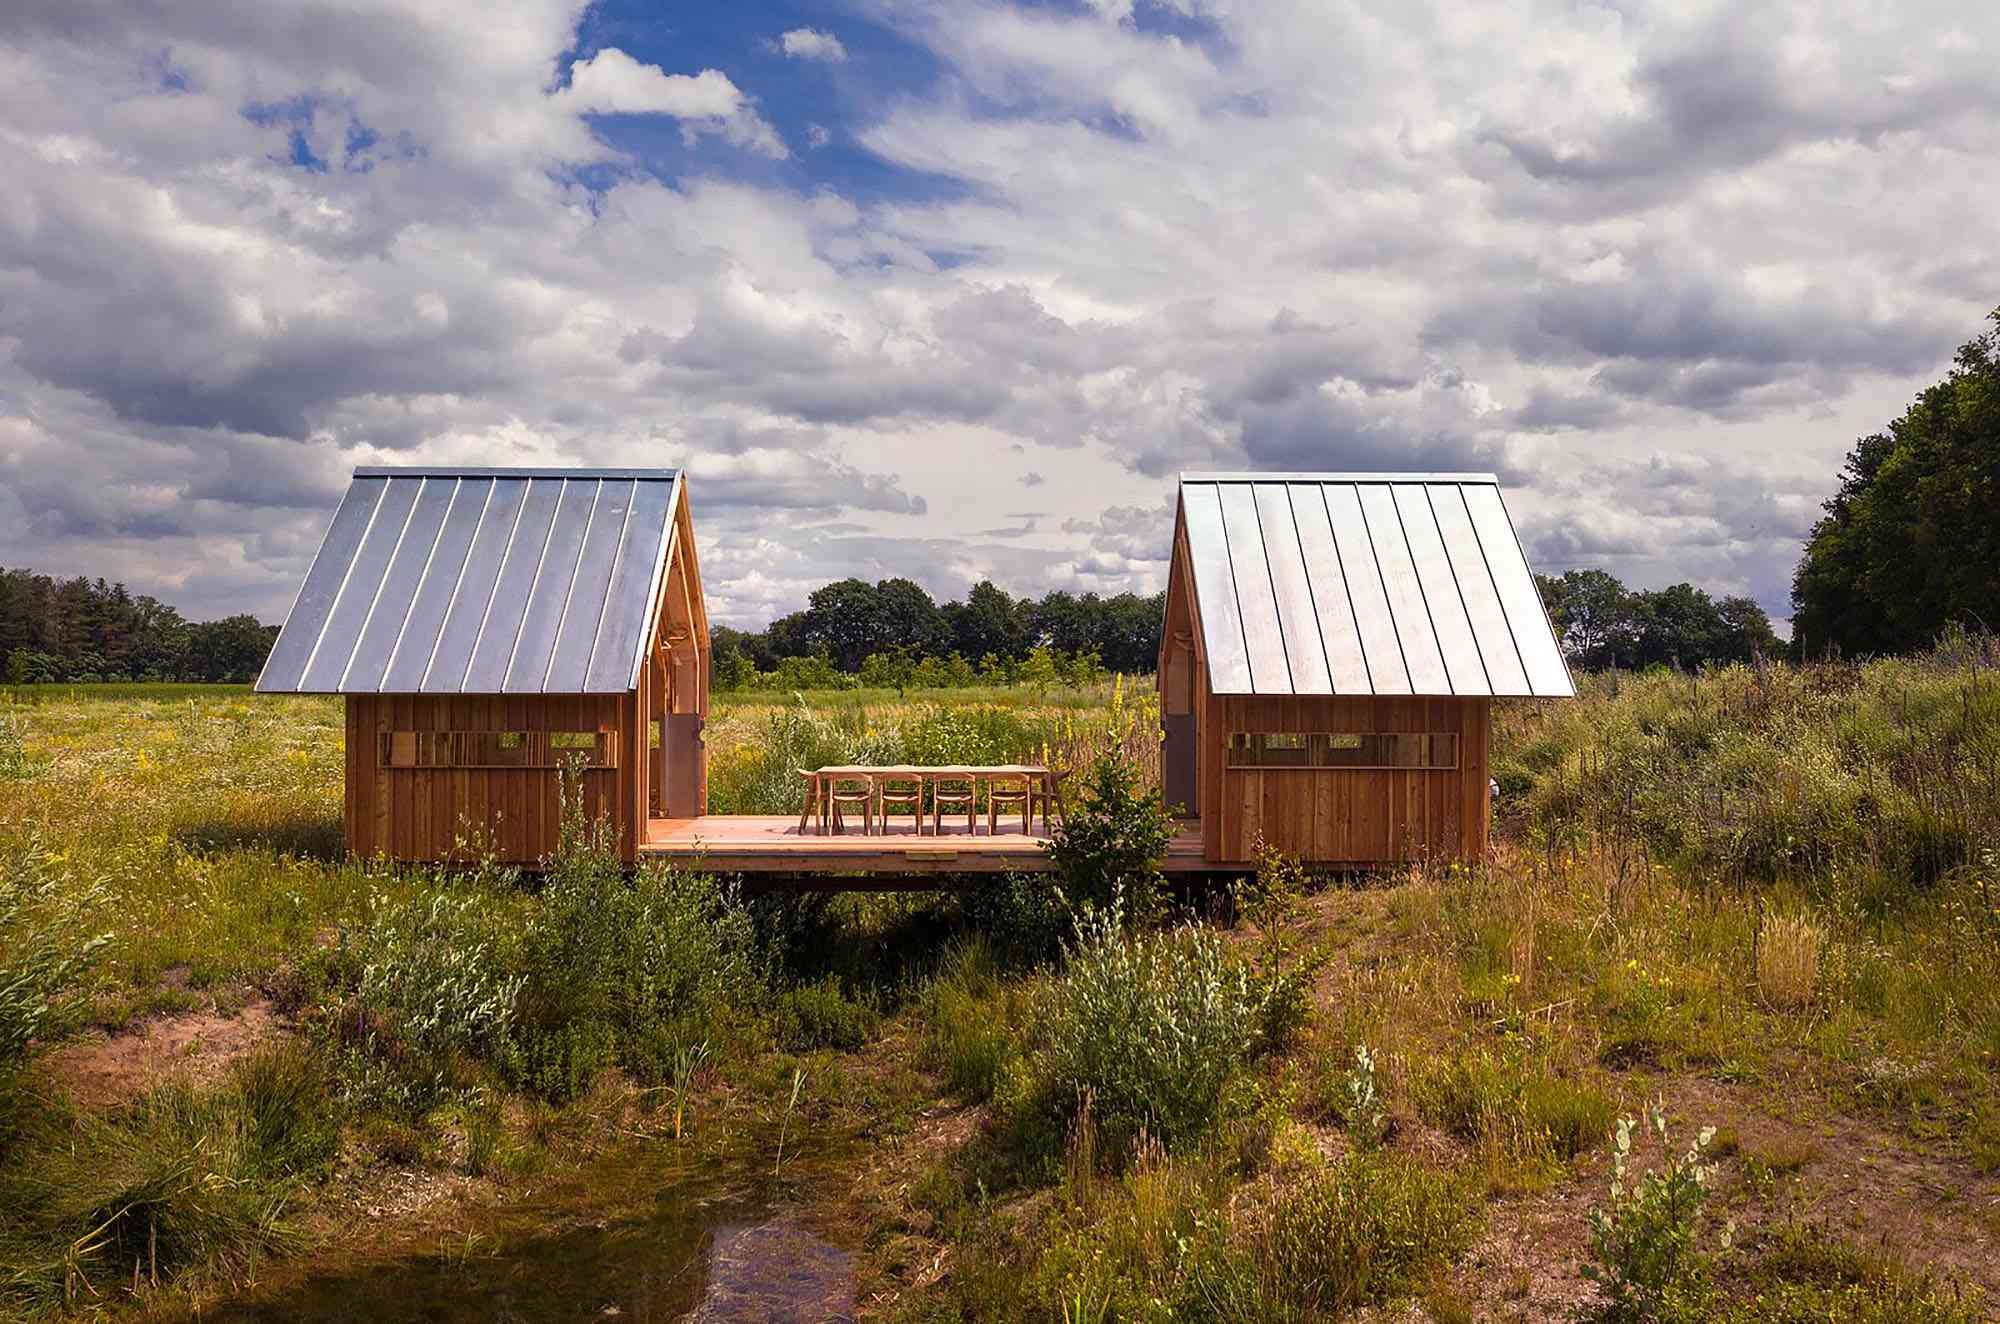 Cabin ANNA by Caspar Schols open in middle